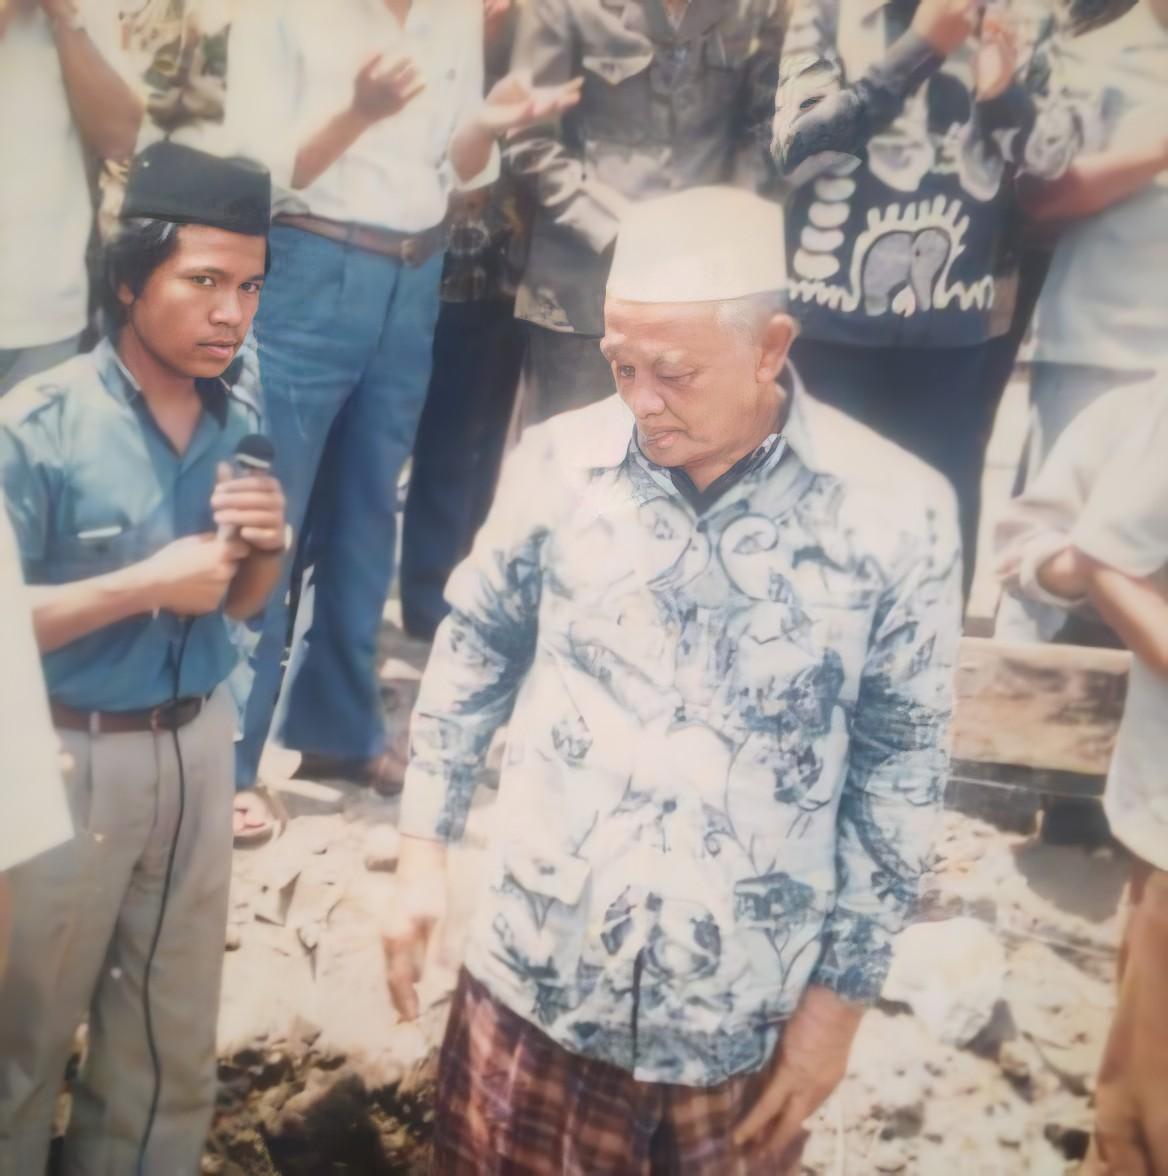 50+ Kumpulan Foto KH. Ali Maksum Krapyak Yogyakarta (HD)